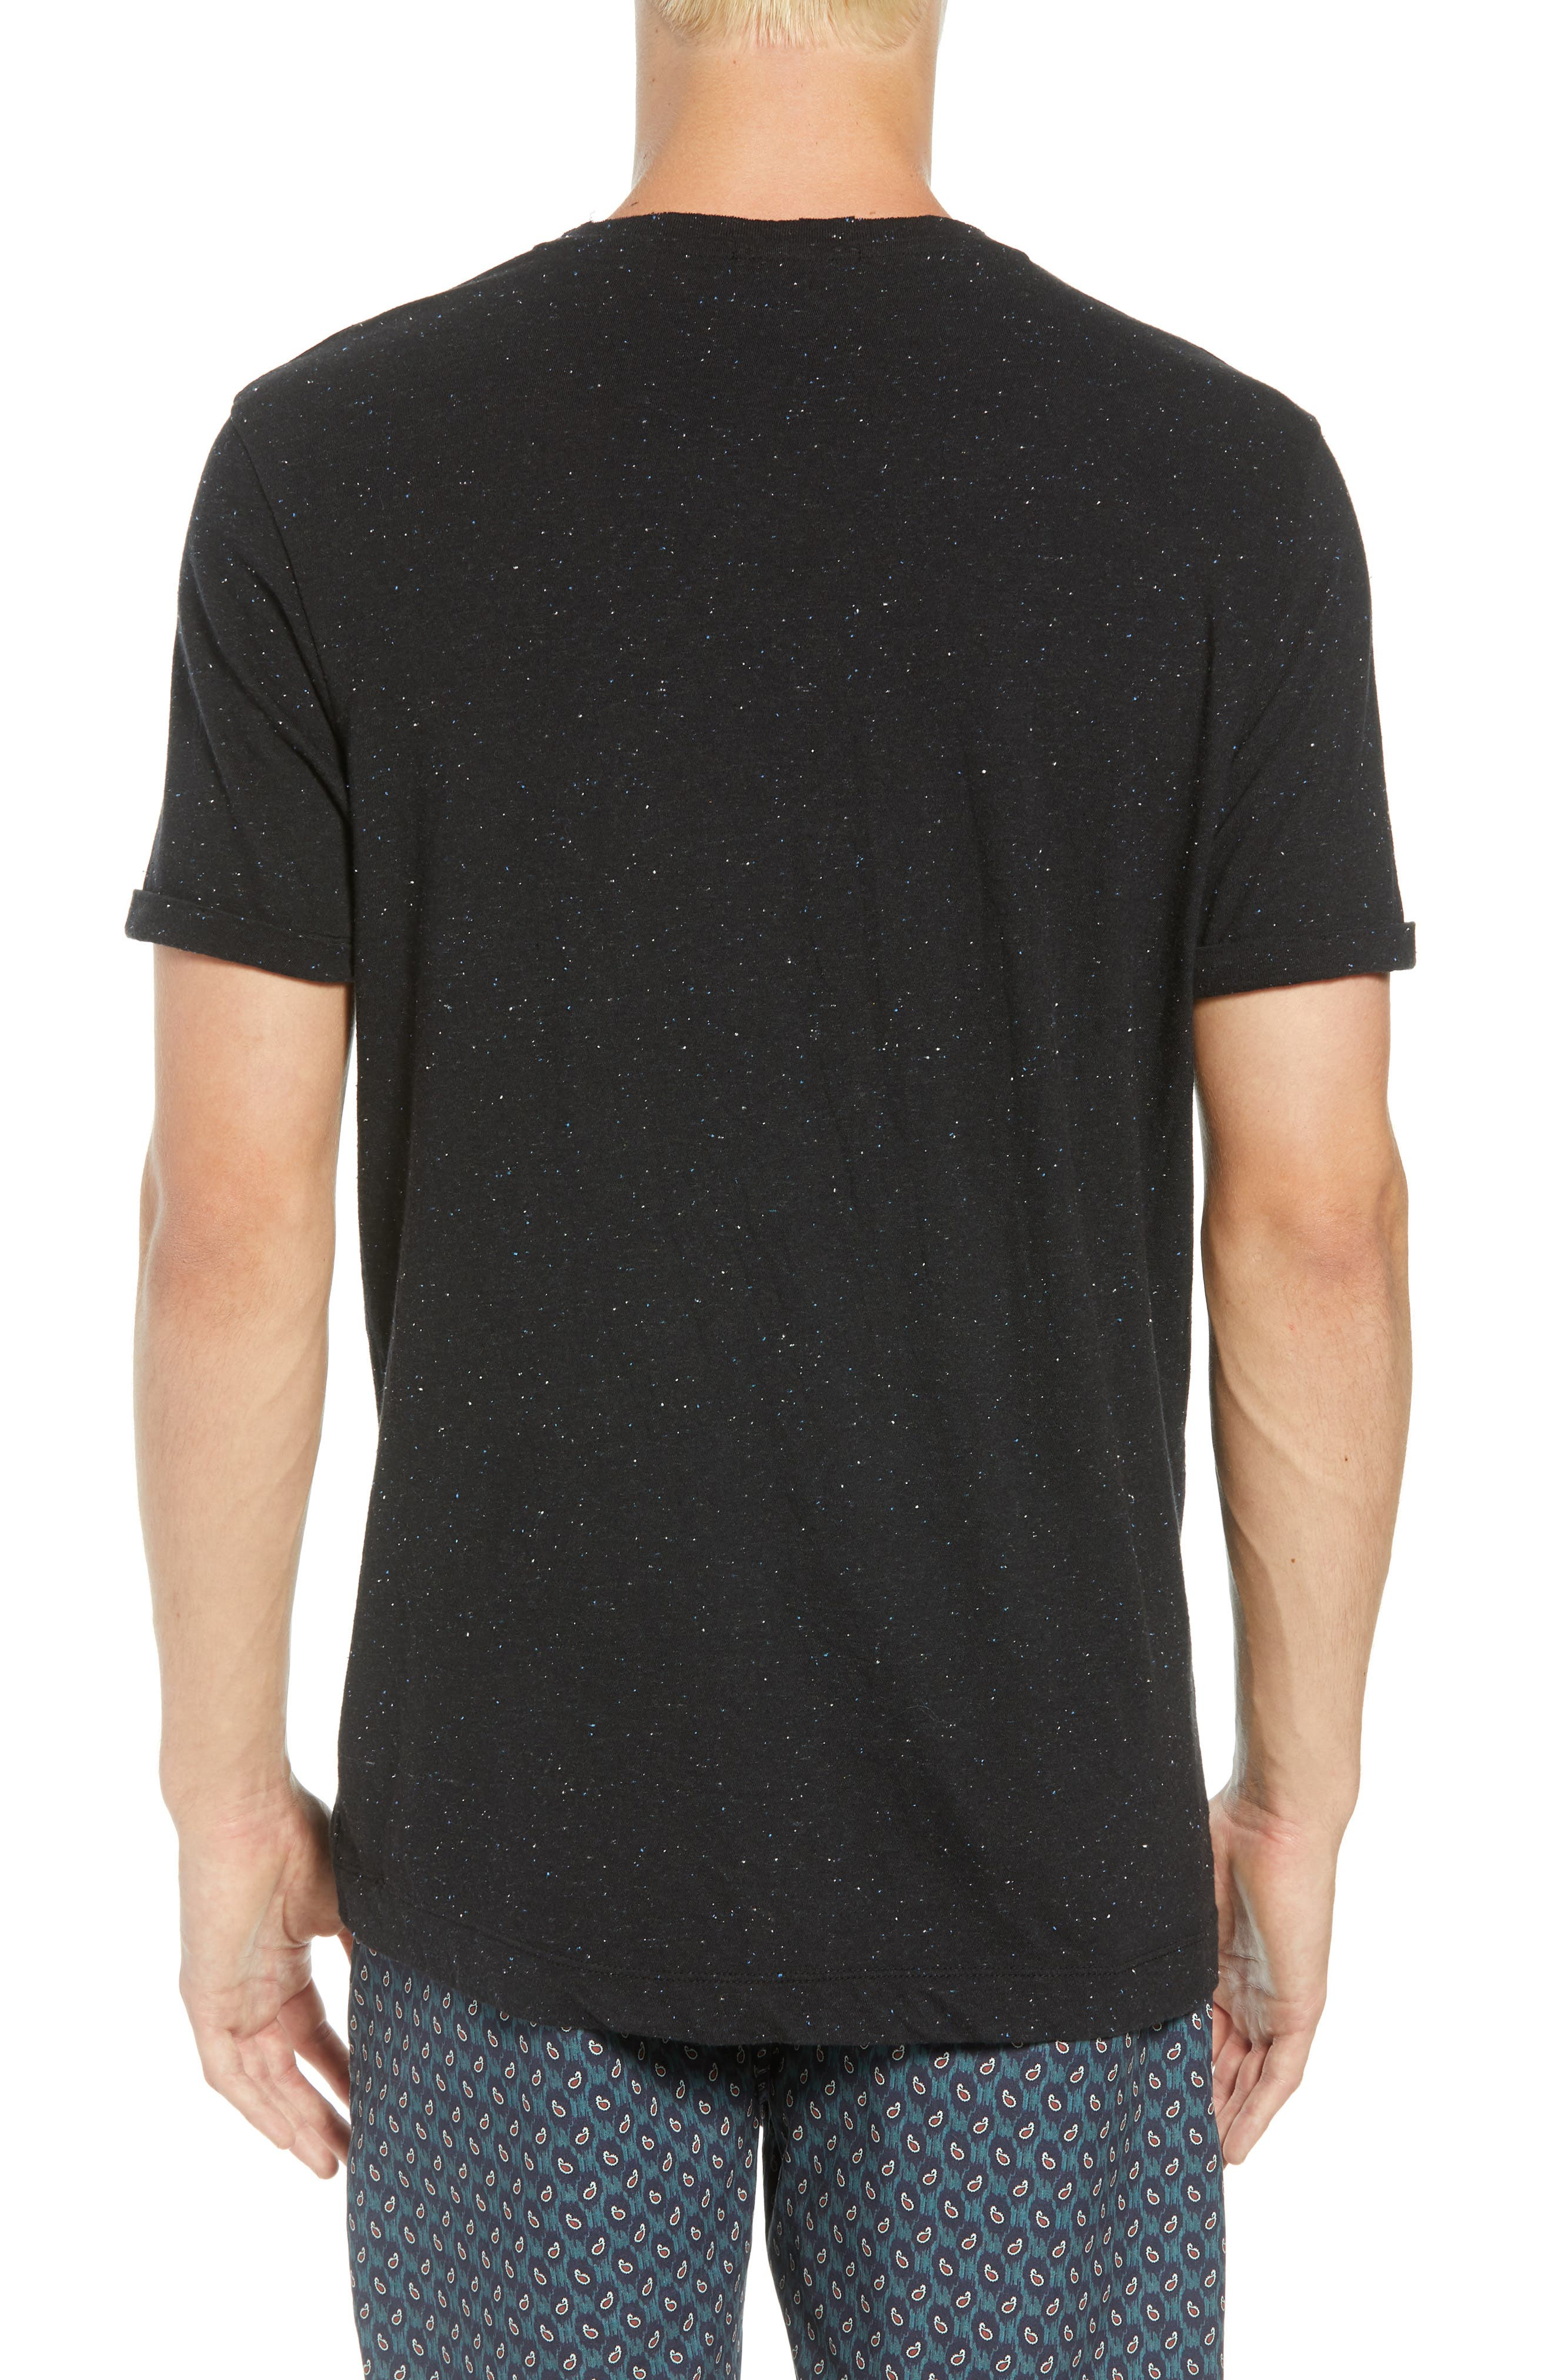 Nep Jersey Pocket T-Shirt,                             Alternate thumbnail 2, color,                             001